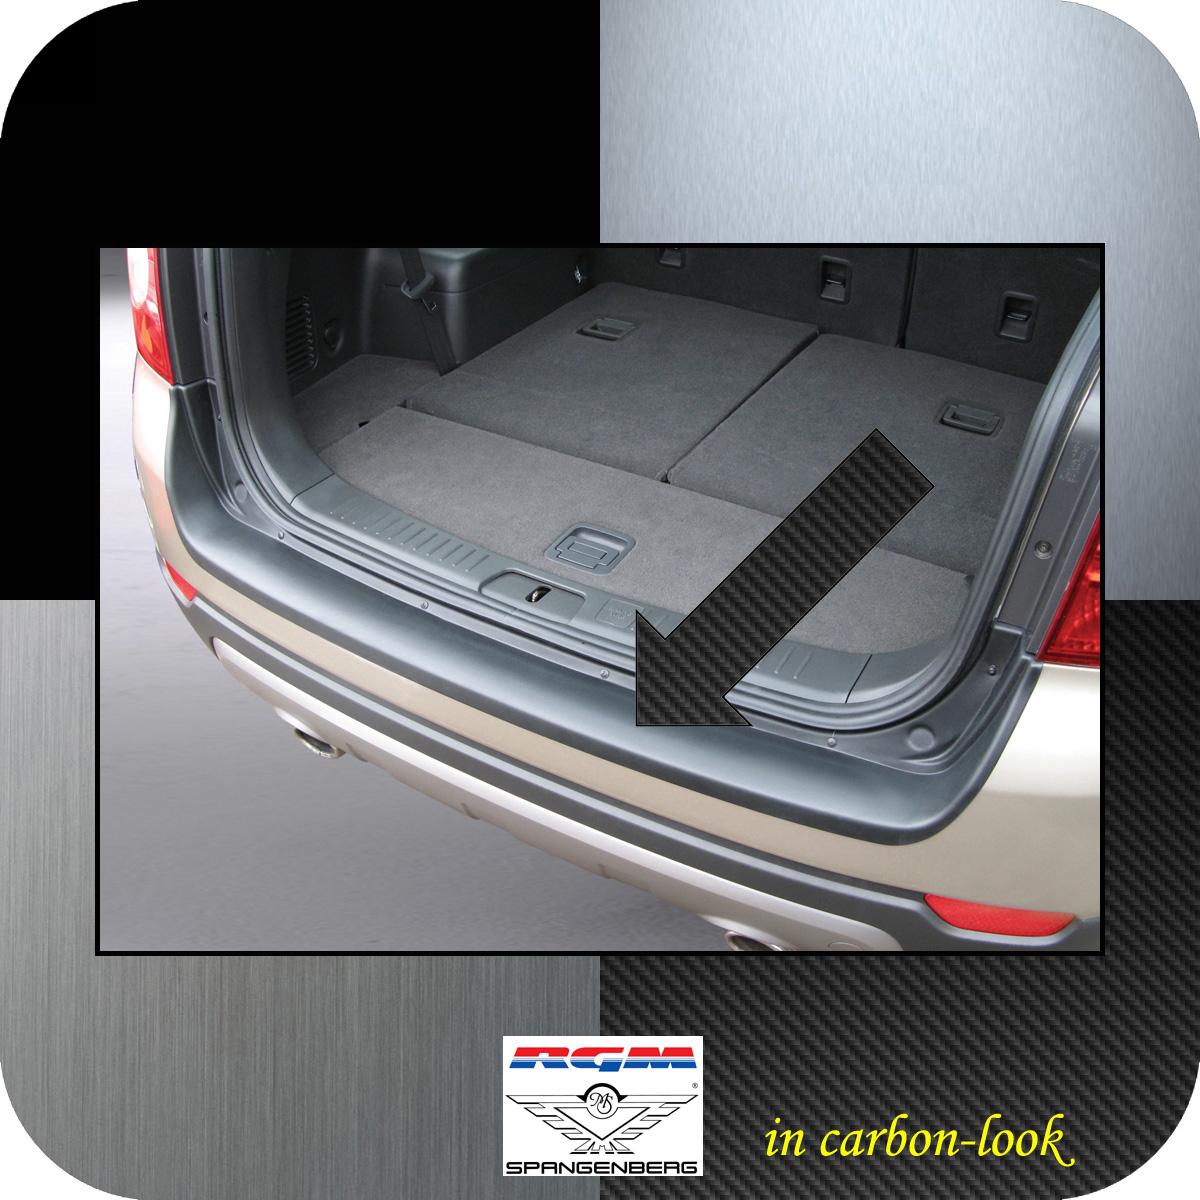 Ladekantenschutz Carbon-Look Chevrolet Captiva SUV 4X4 vor Mopf 2006-13 3509322